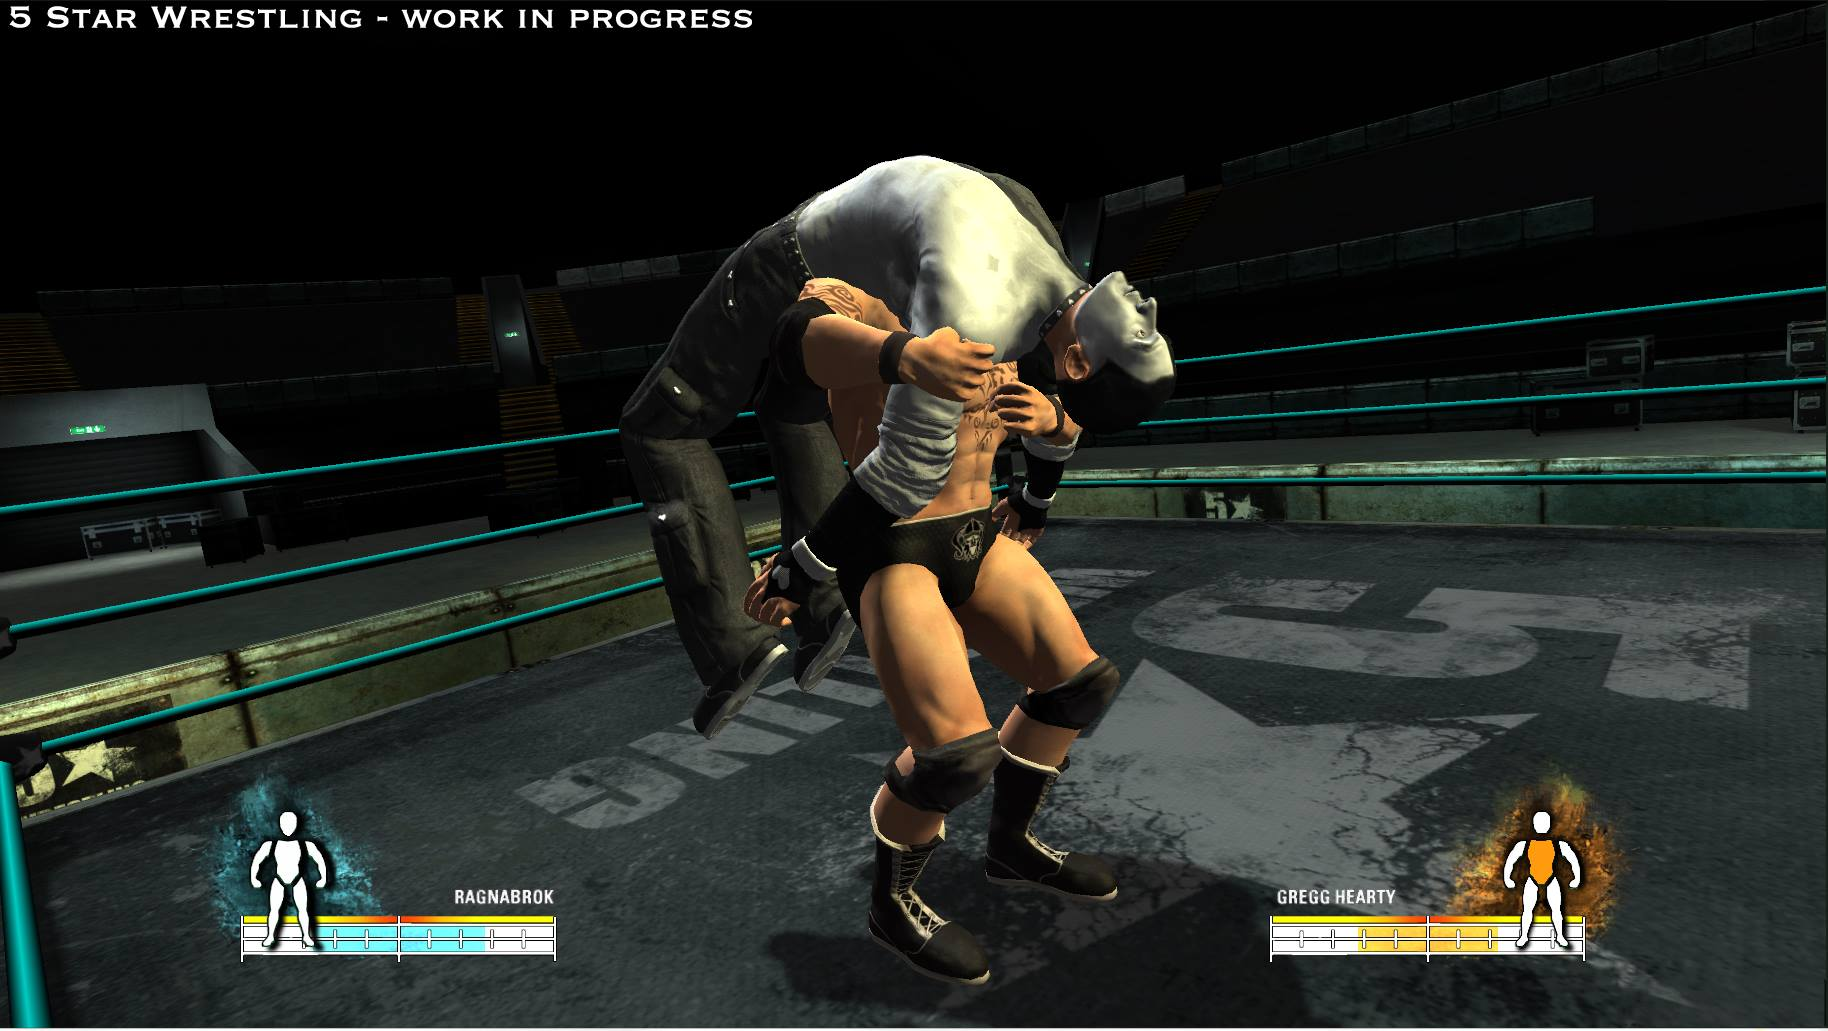 serious parody shacknews com video game news trailers game